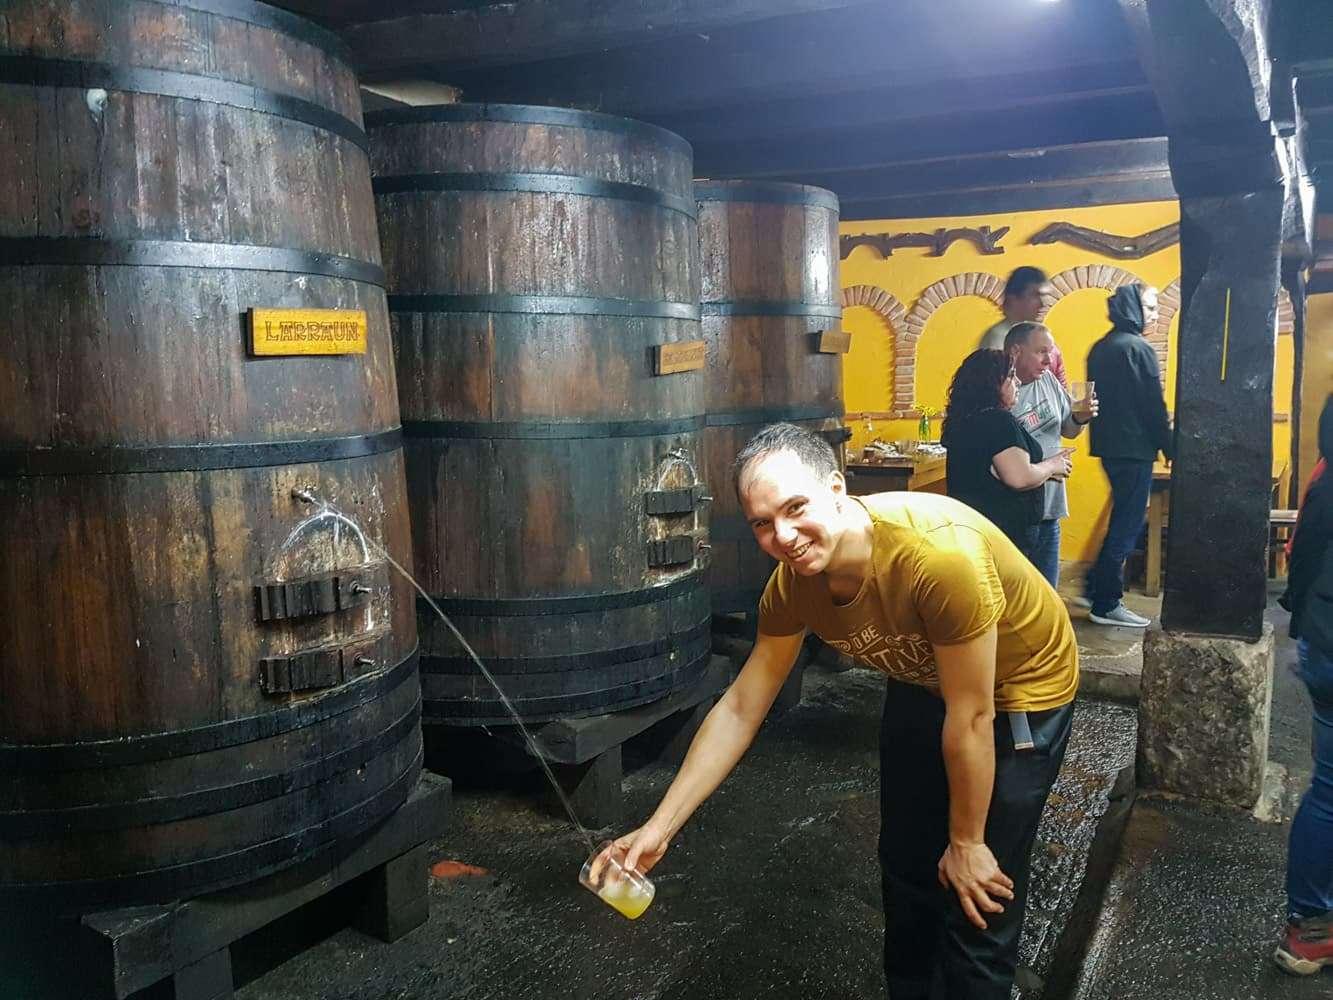 Txotx, Alberto echándose sidra de las kupelas de la sidrería Martitxonea en Aldatz